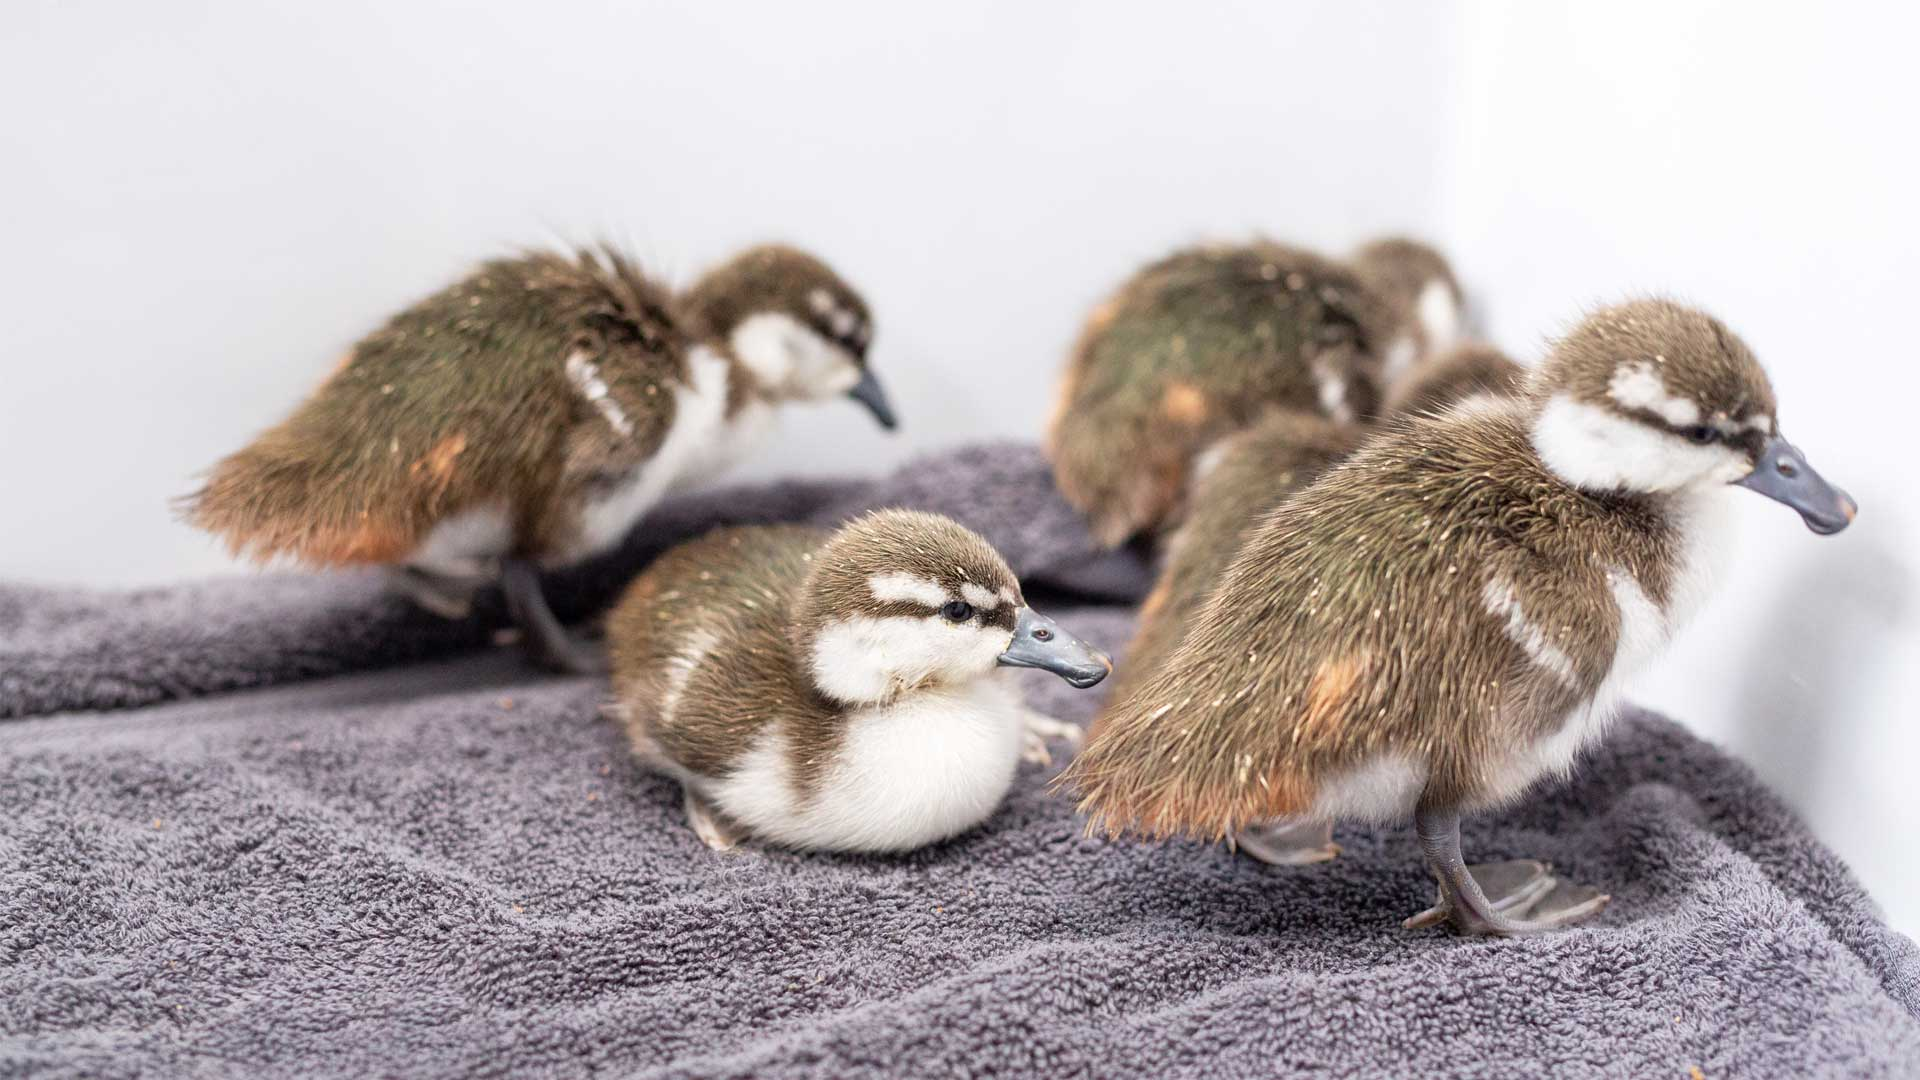 https://rfacdn.nz/zoo/assets/media/whio-duckling-gallery-7.jpg